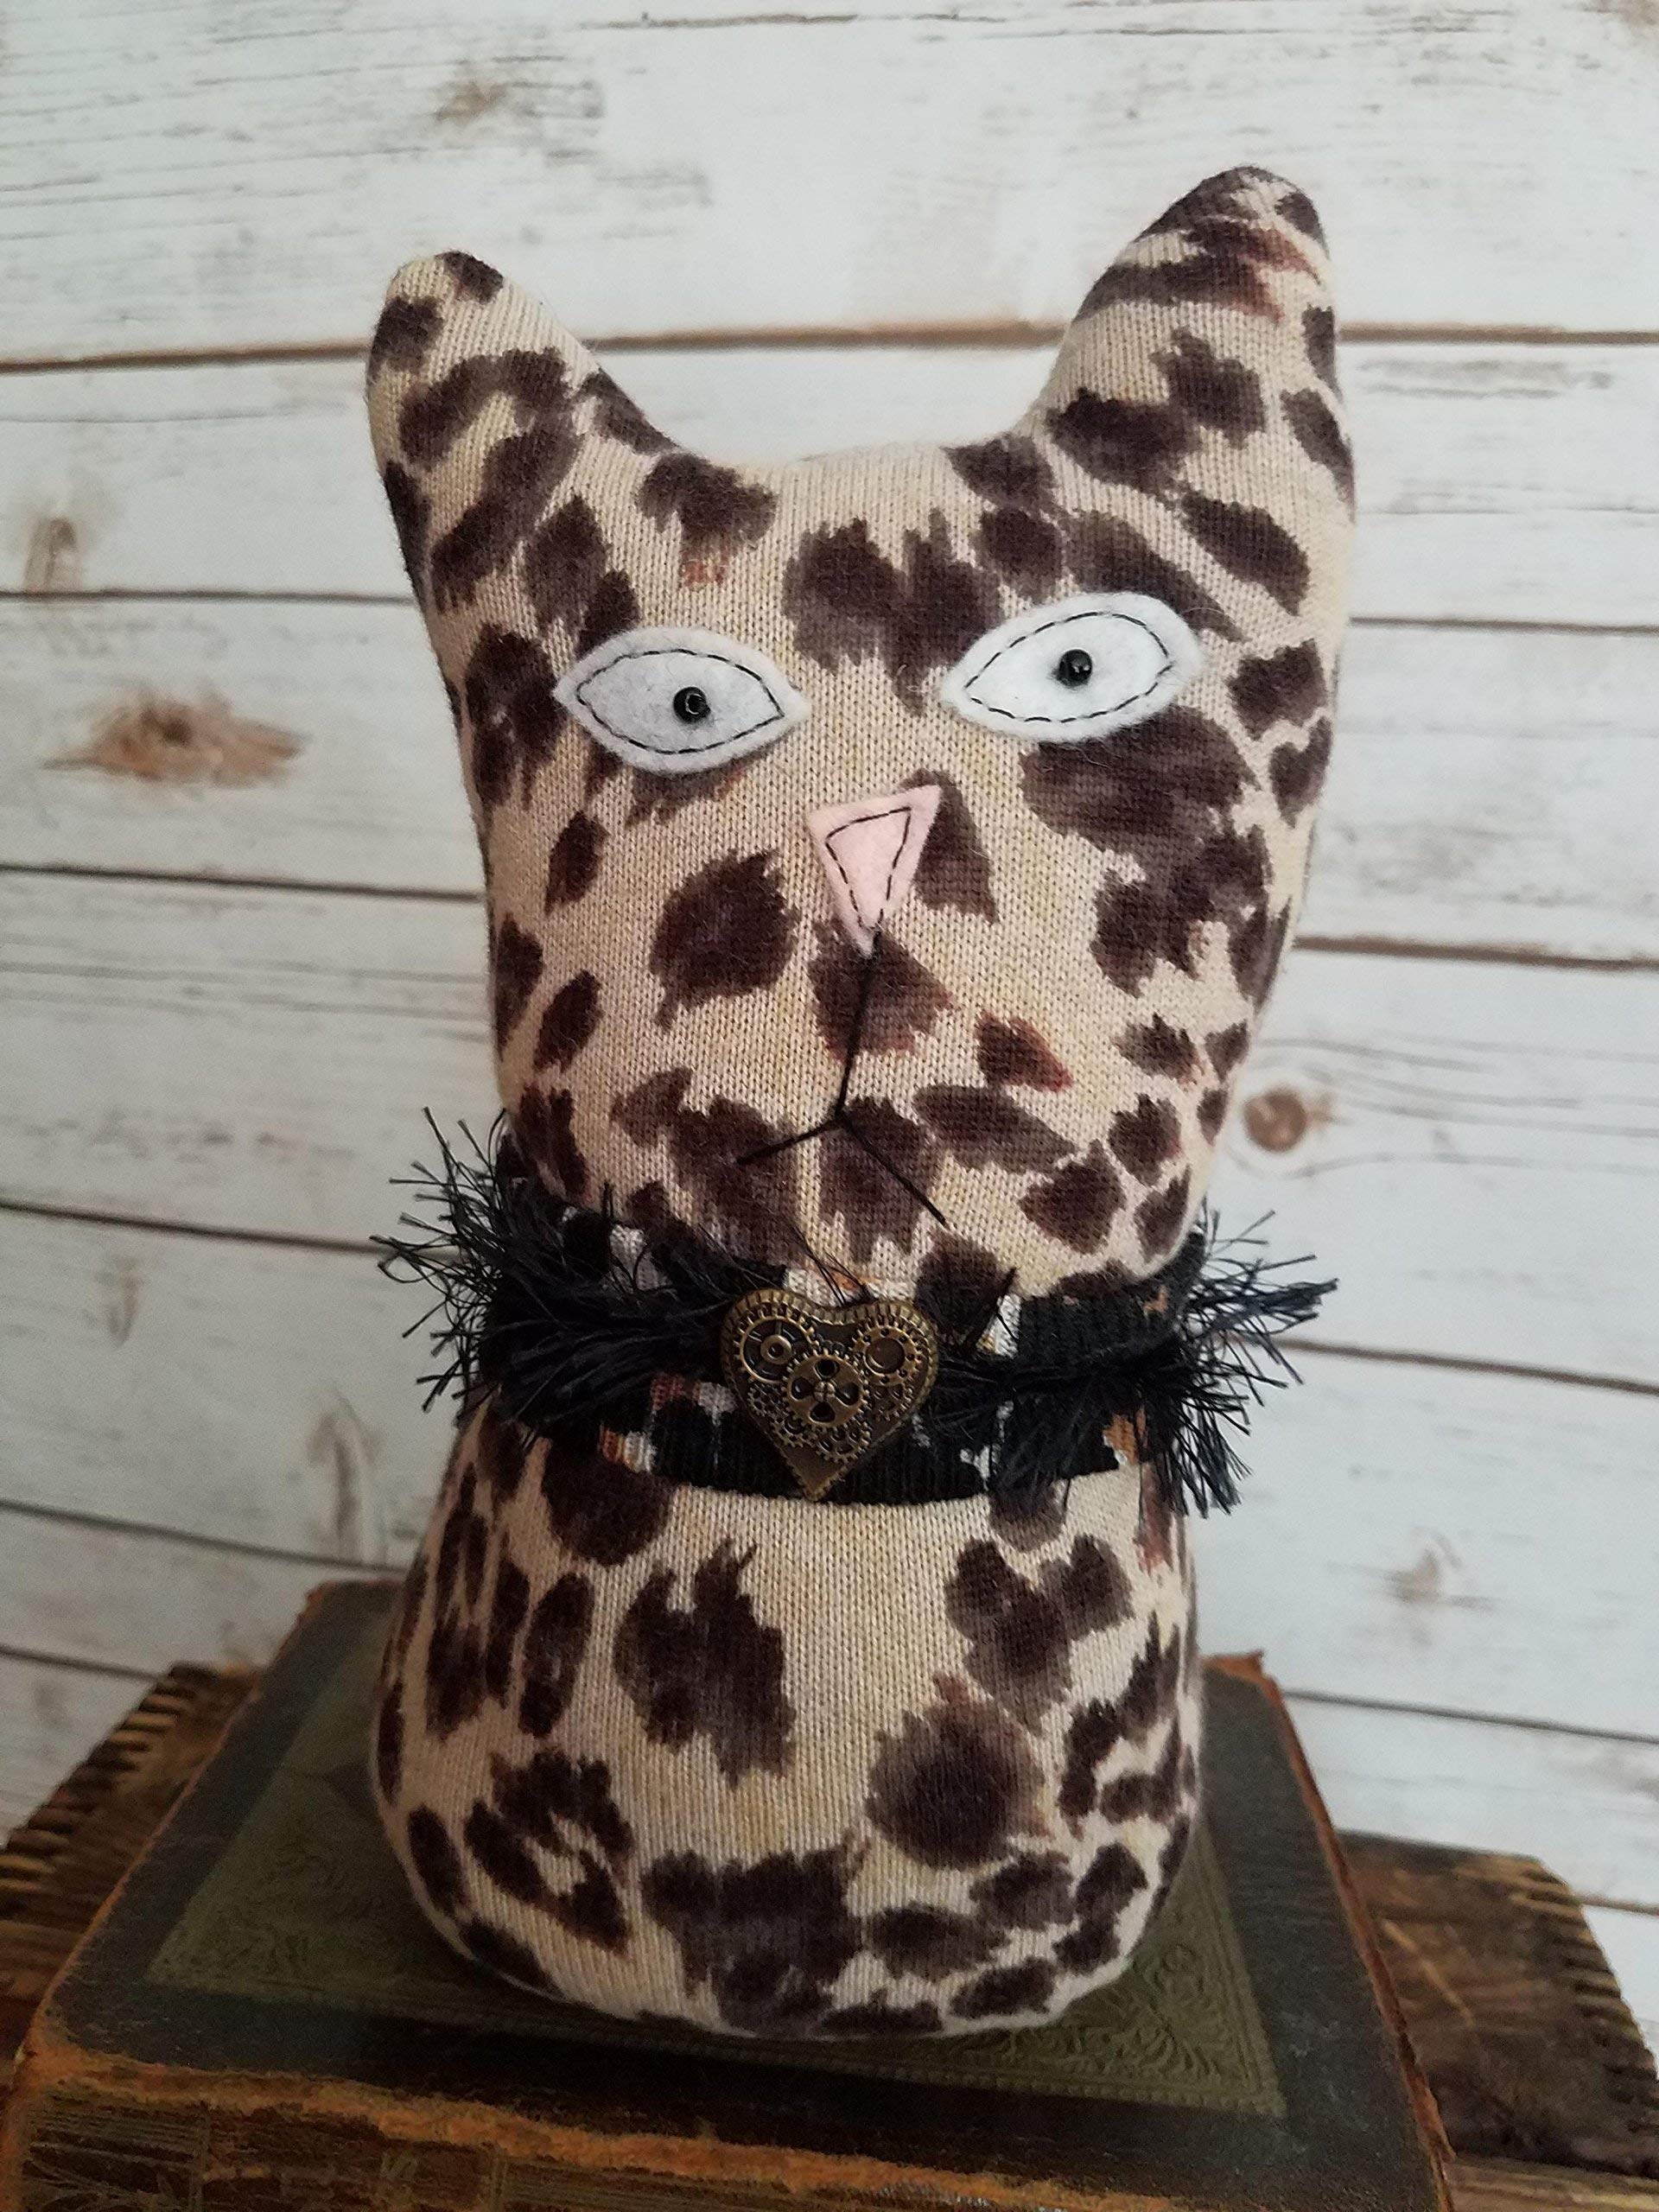 9'' Tall Ragamuffin Ugly Sweater Handmade Kitty Cat Art Doll Retro Glam Steampunk Leopard Stuffed Animal Cat Lovers Gift